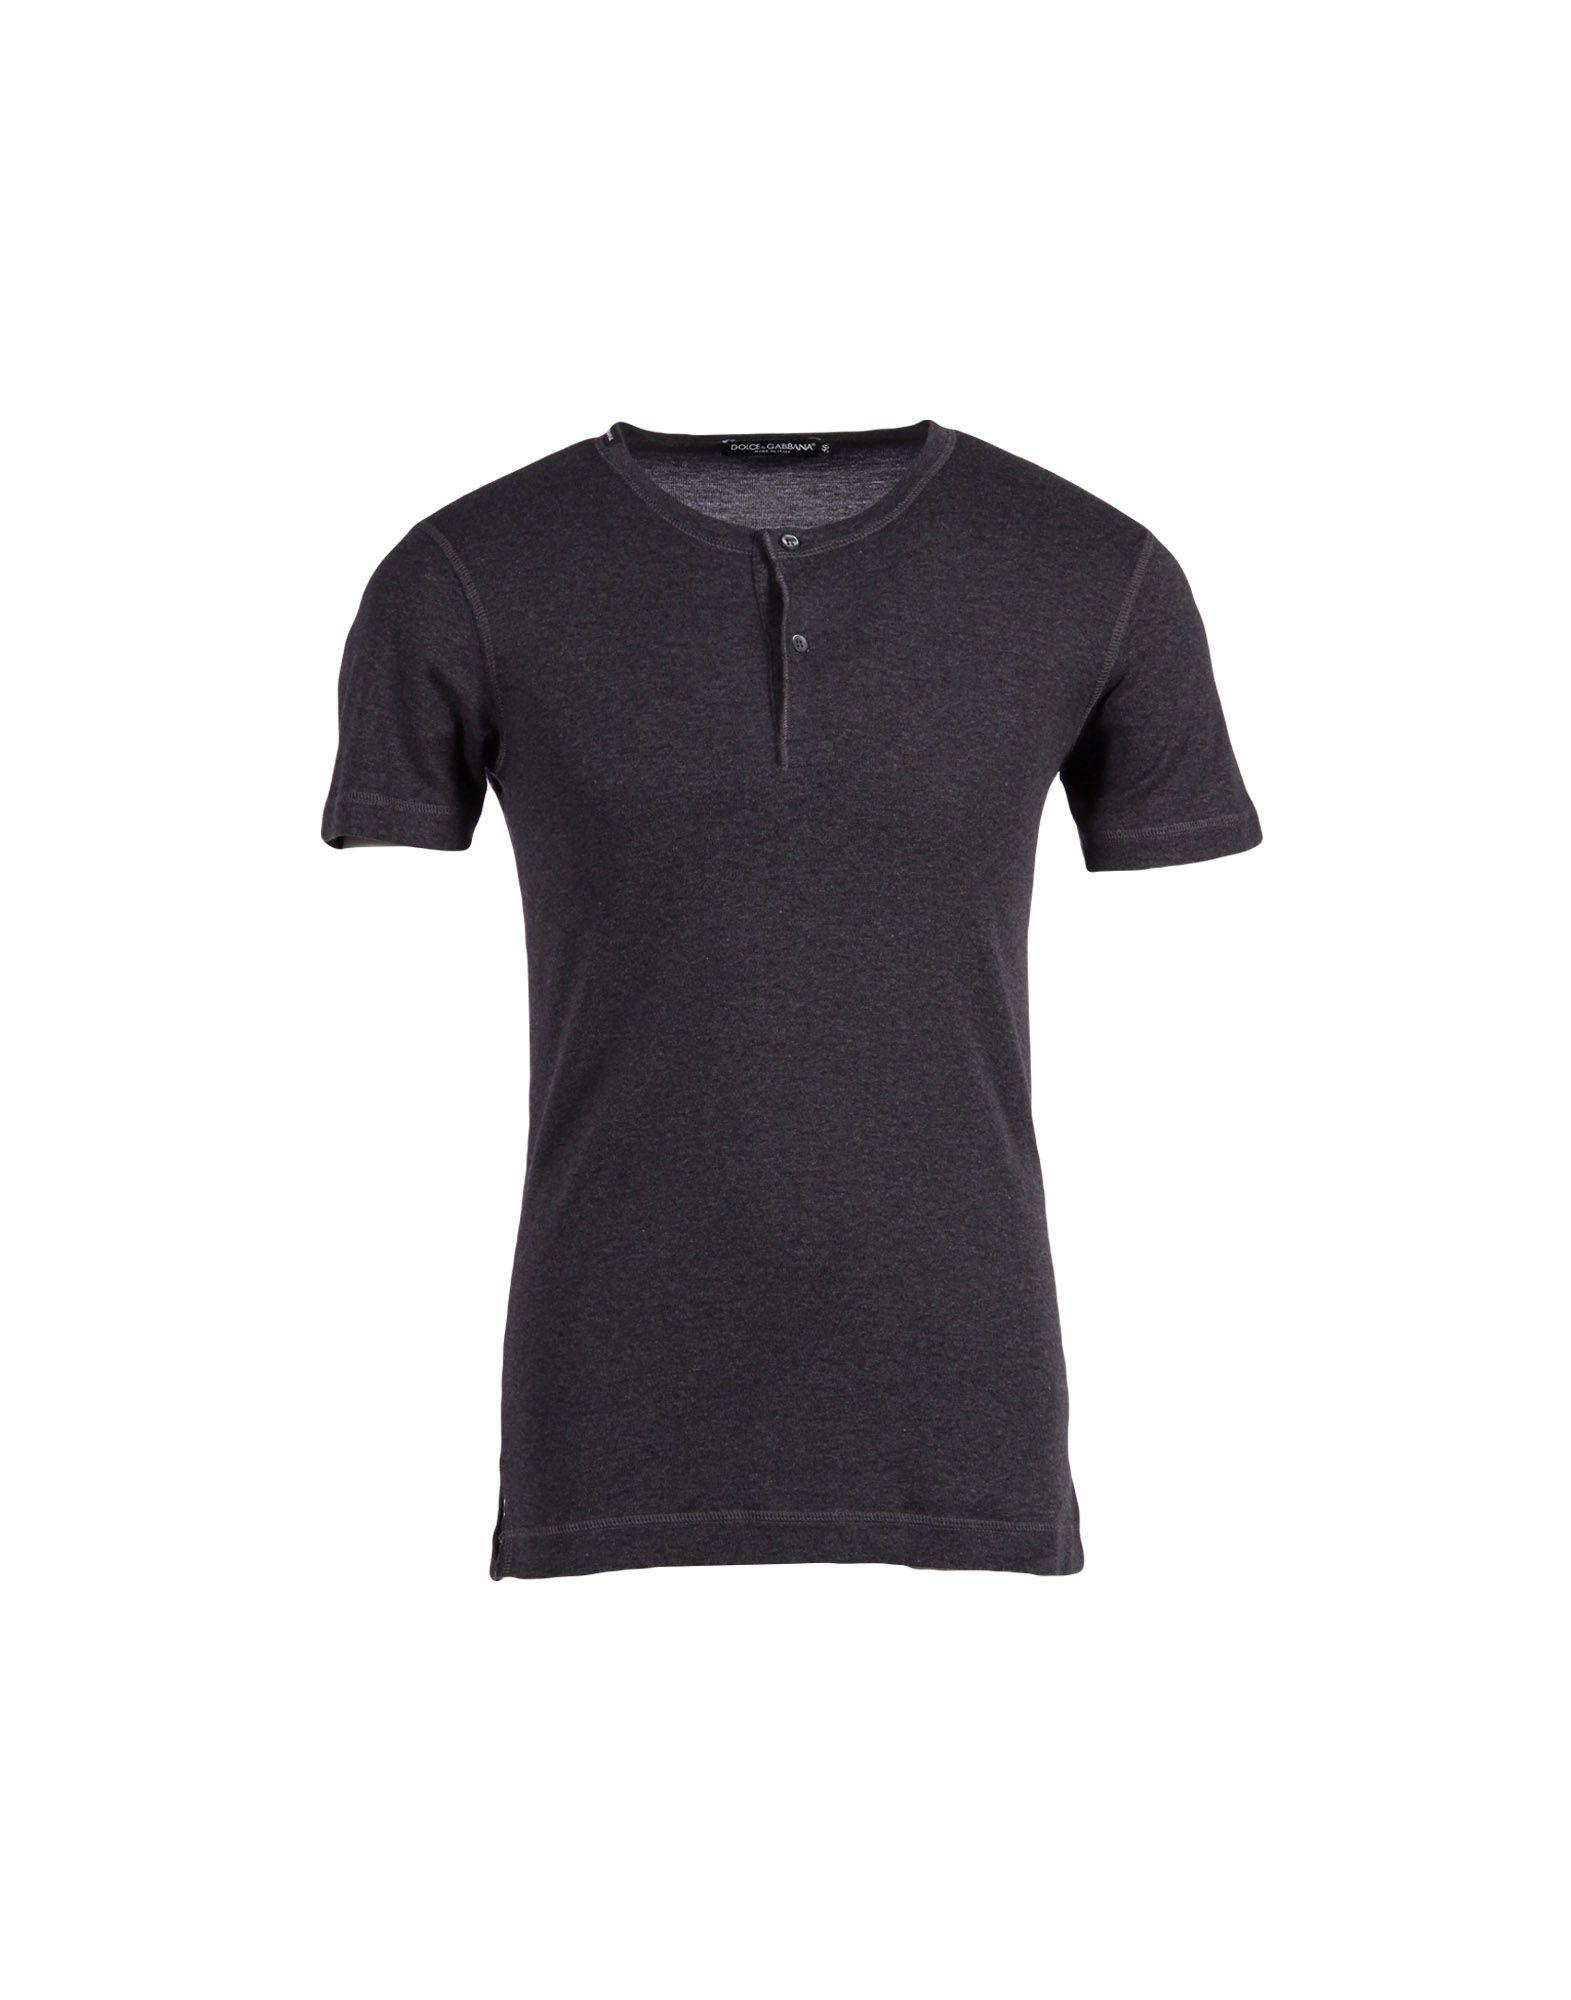 dolce gabbana t shirt in gray for men lead lyst. Black Bedroom Furniture Sets. Home Design Ideas